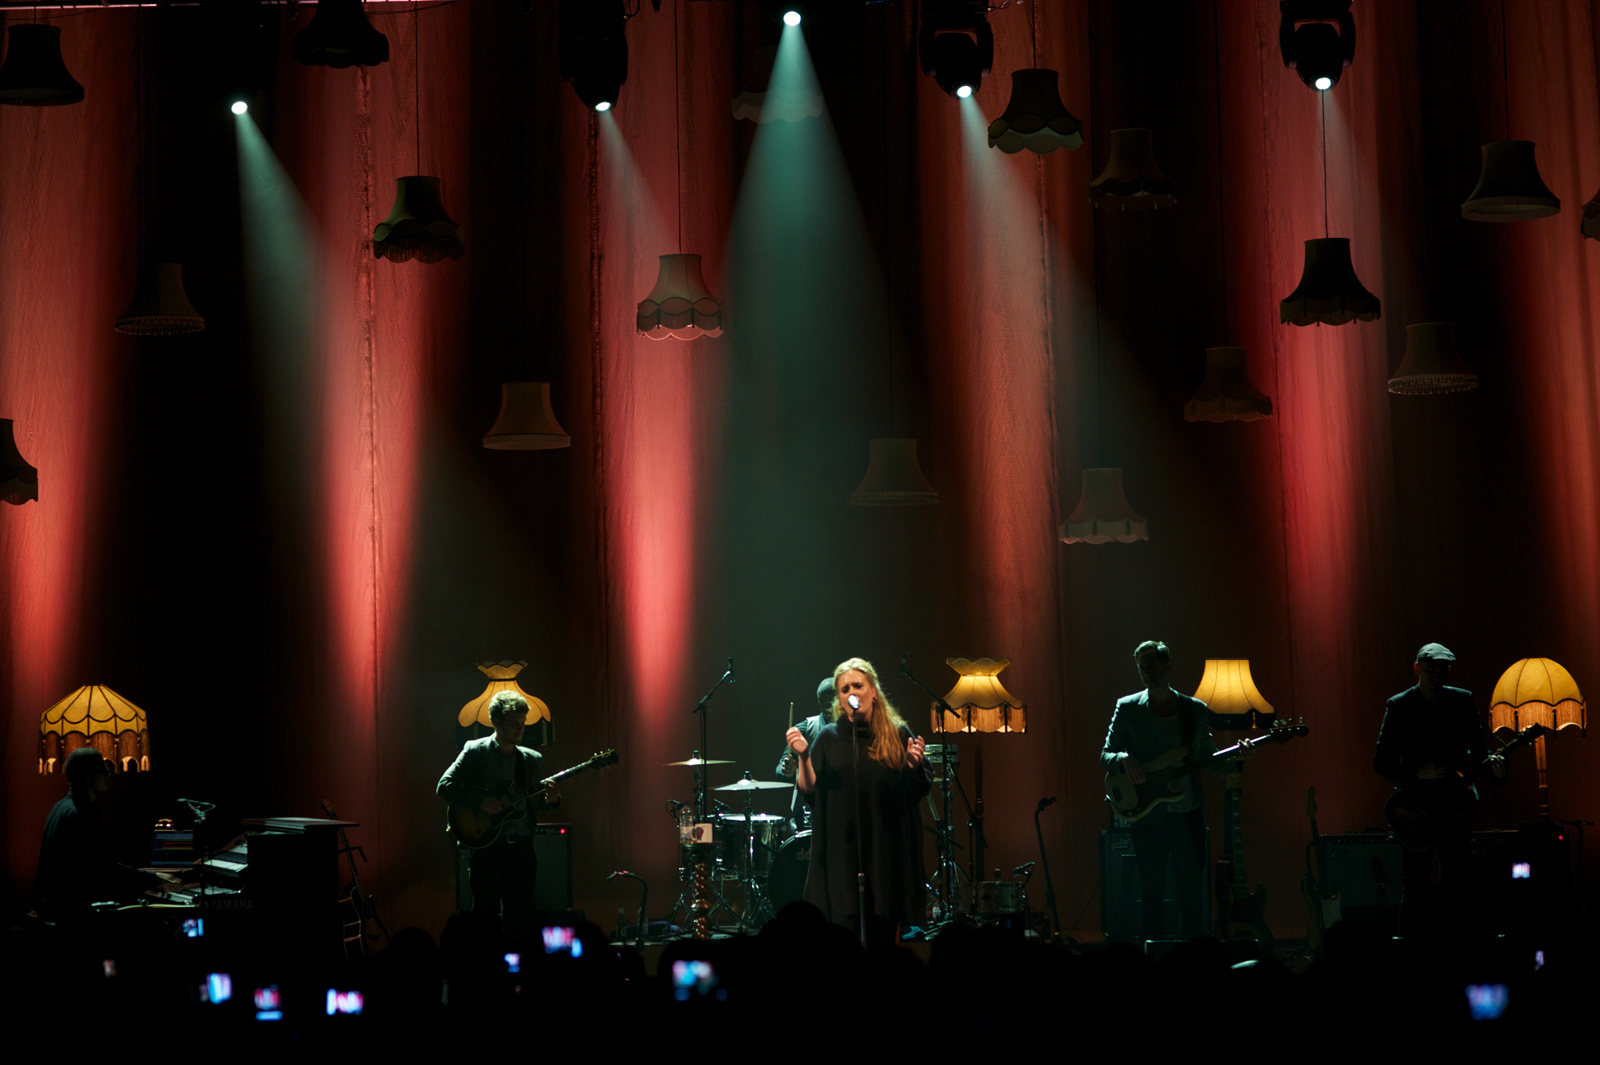 Adele, Southampton, 2011